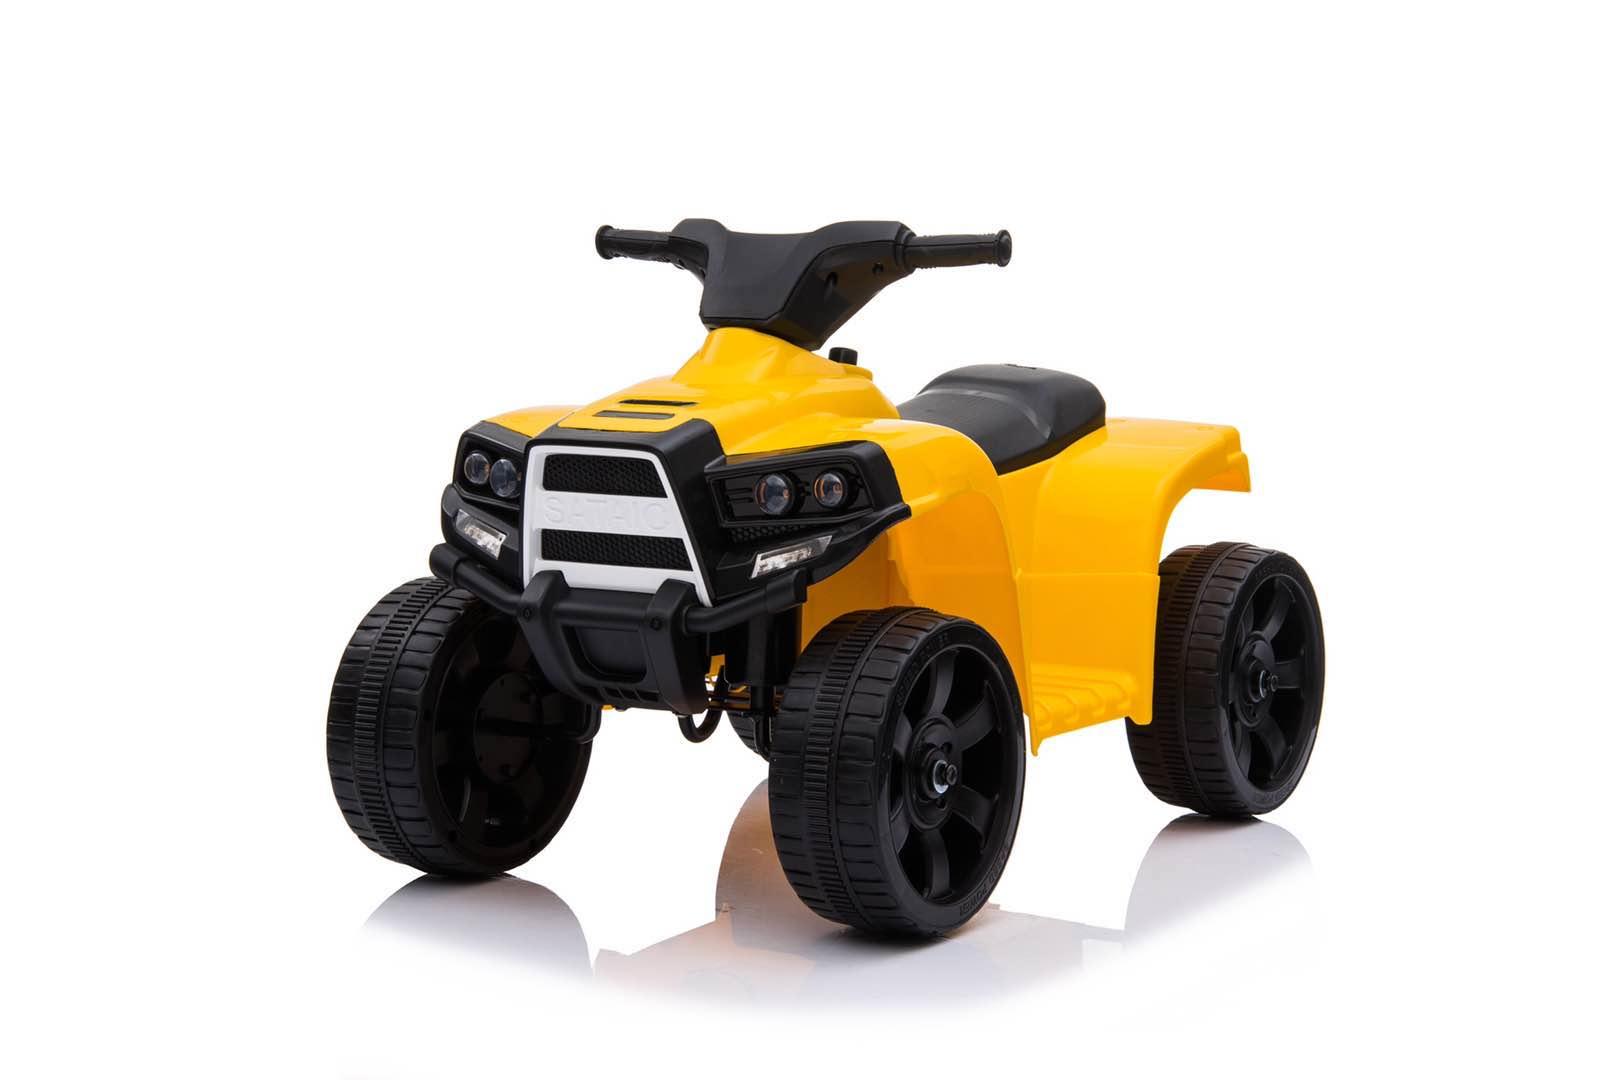 City-Ride  CR056YW Квадроцикл, 6V4. 5*1, 20W*1, движ. вперед-назад, свет, звук, мелодии В. Шаинского, пласт. колёса, цв. желтый в. к 62х35х28см